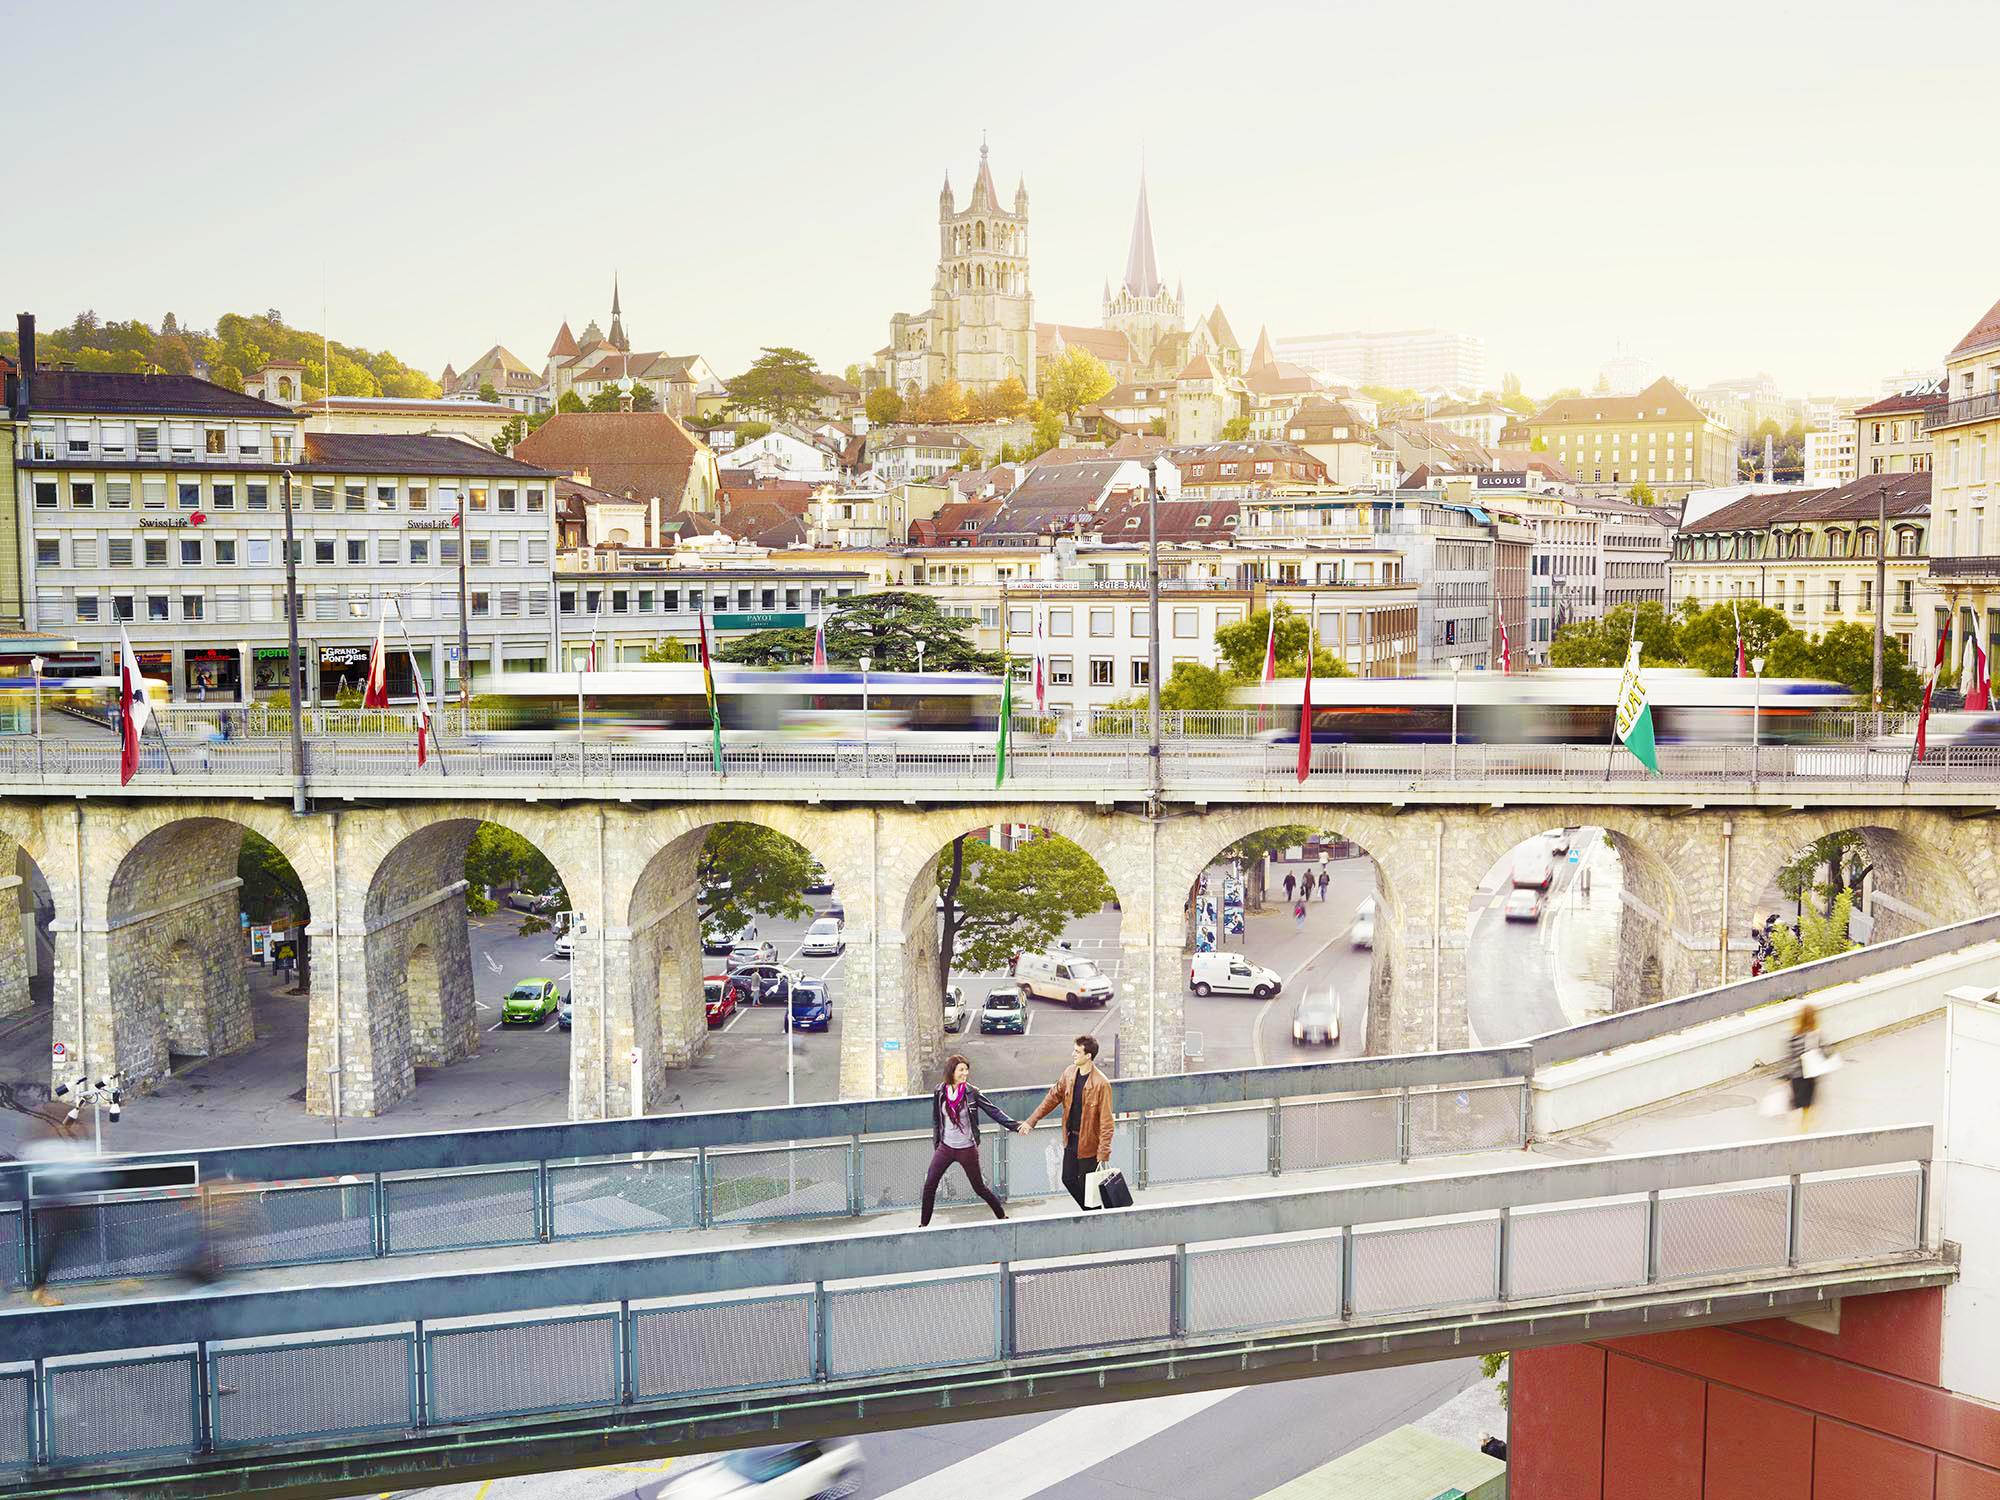 kt_2020_300_Keytours_excursions_Swisstours_lausanne_city5_2000_10